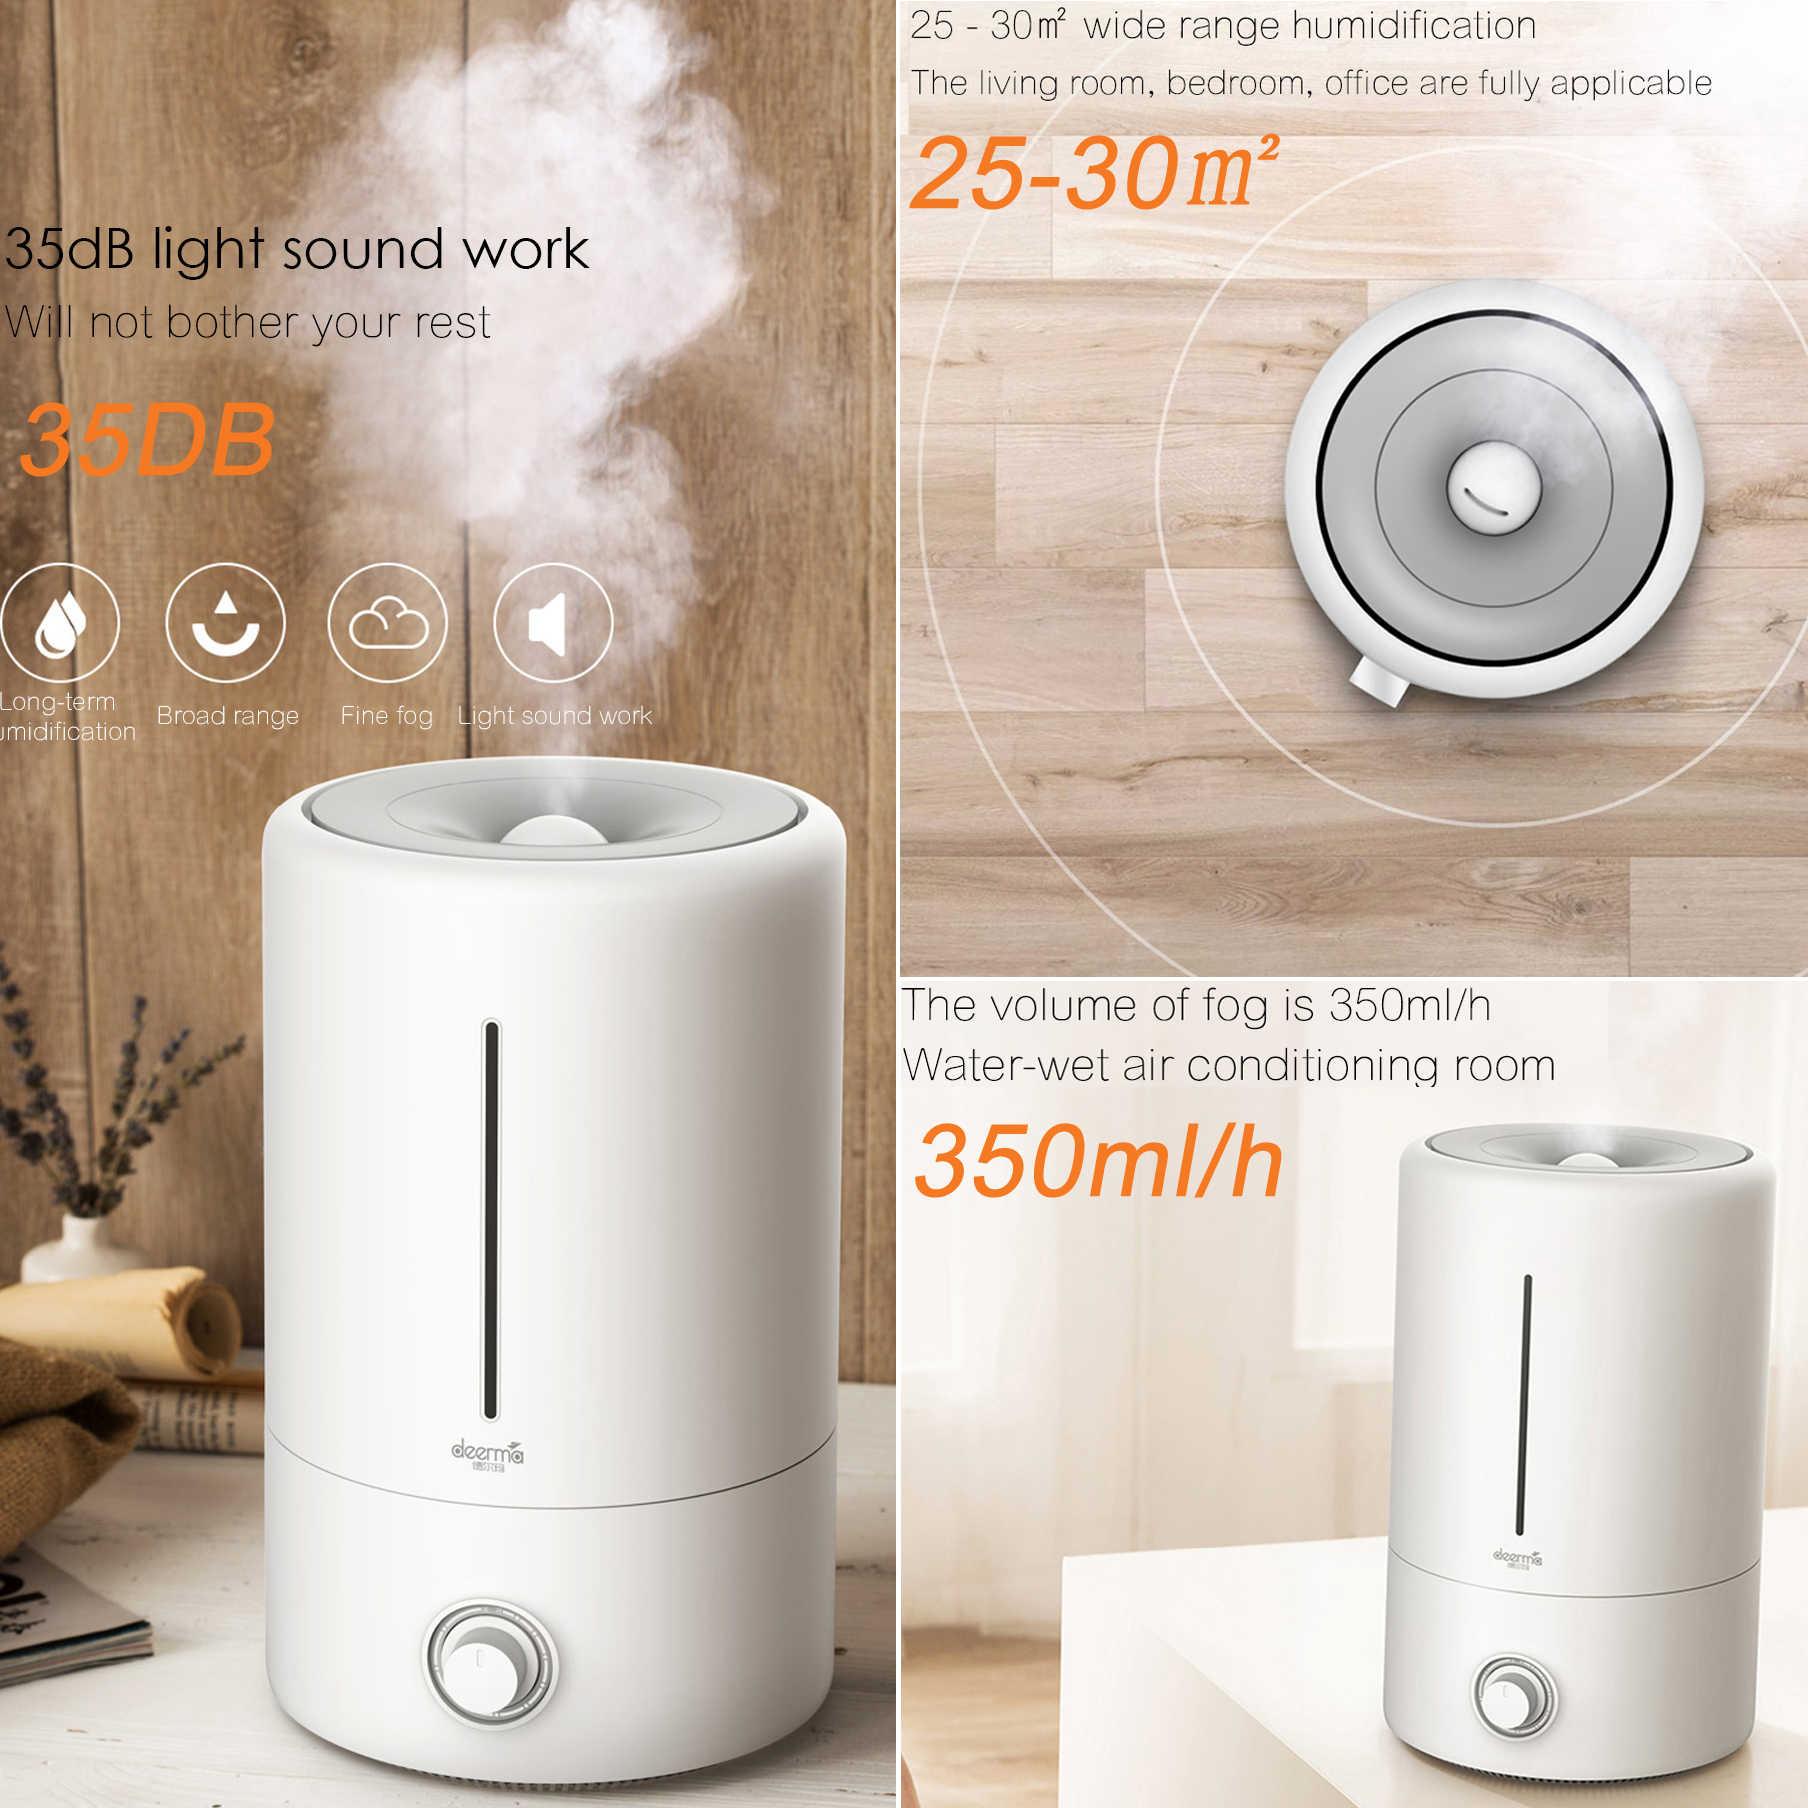 Xiaomi Deerma DEM F628 5L Air Humidifier Diffuser Purifier Filter Ultramute  Ultrasonic Pregnant Baby Clean Bedroom Home Office| | - AliExpress